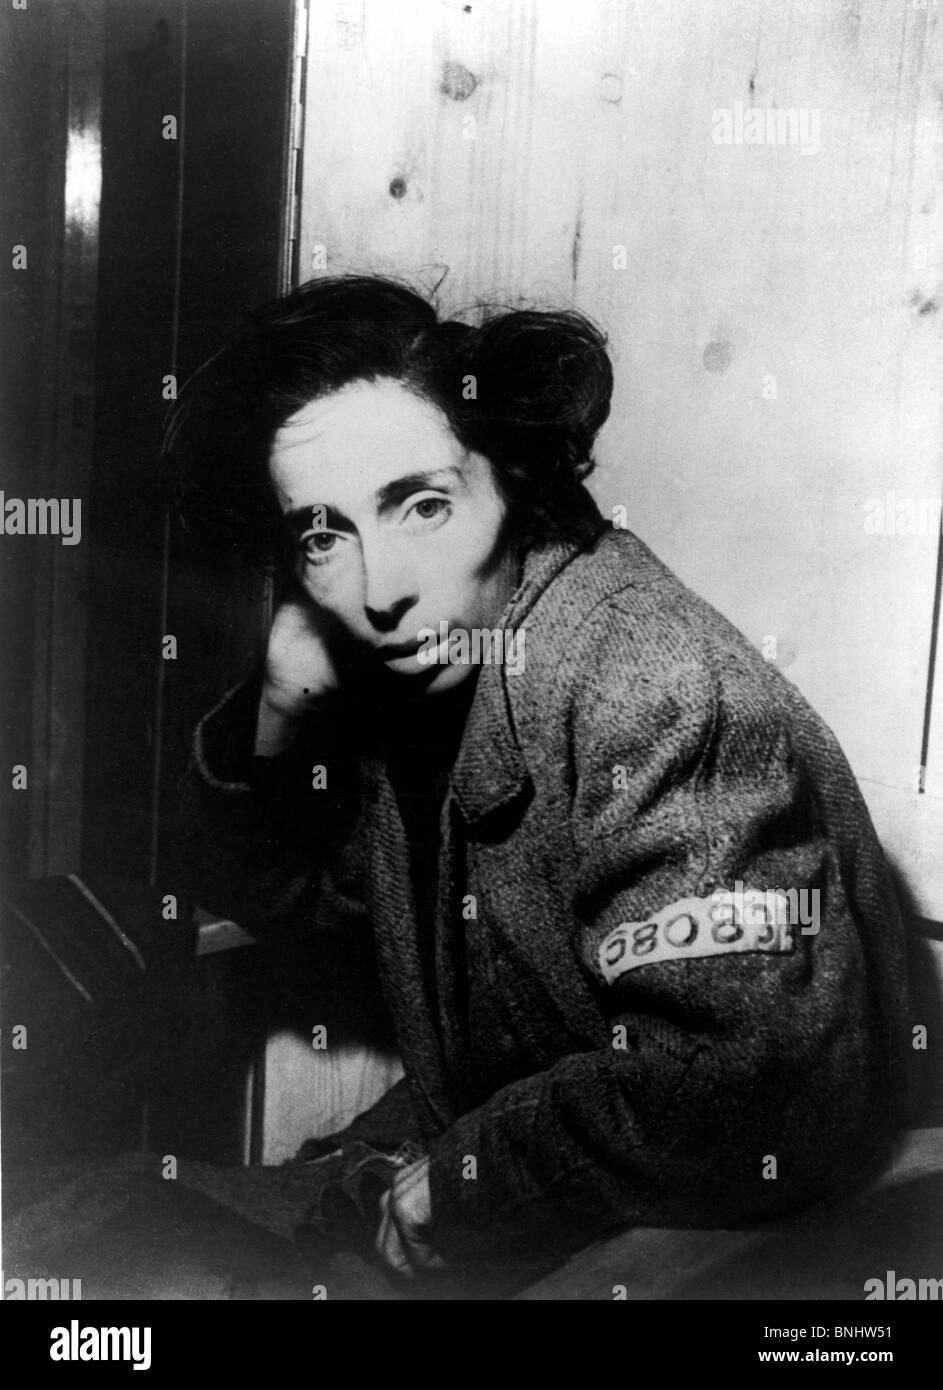 World War II Penig-Langenleuba Jewish woman Jews Holocaust Germany April 1945 history historical historic prisoners - Stock Image